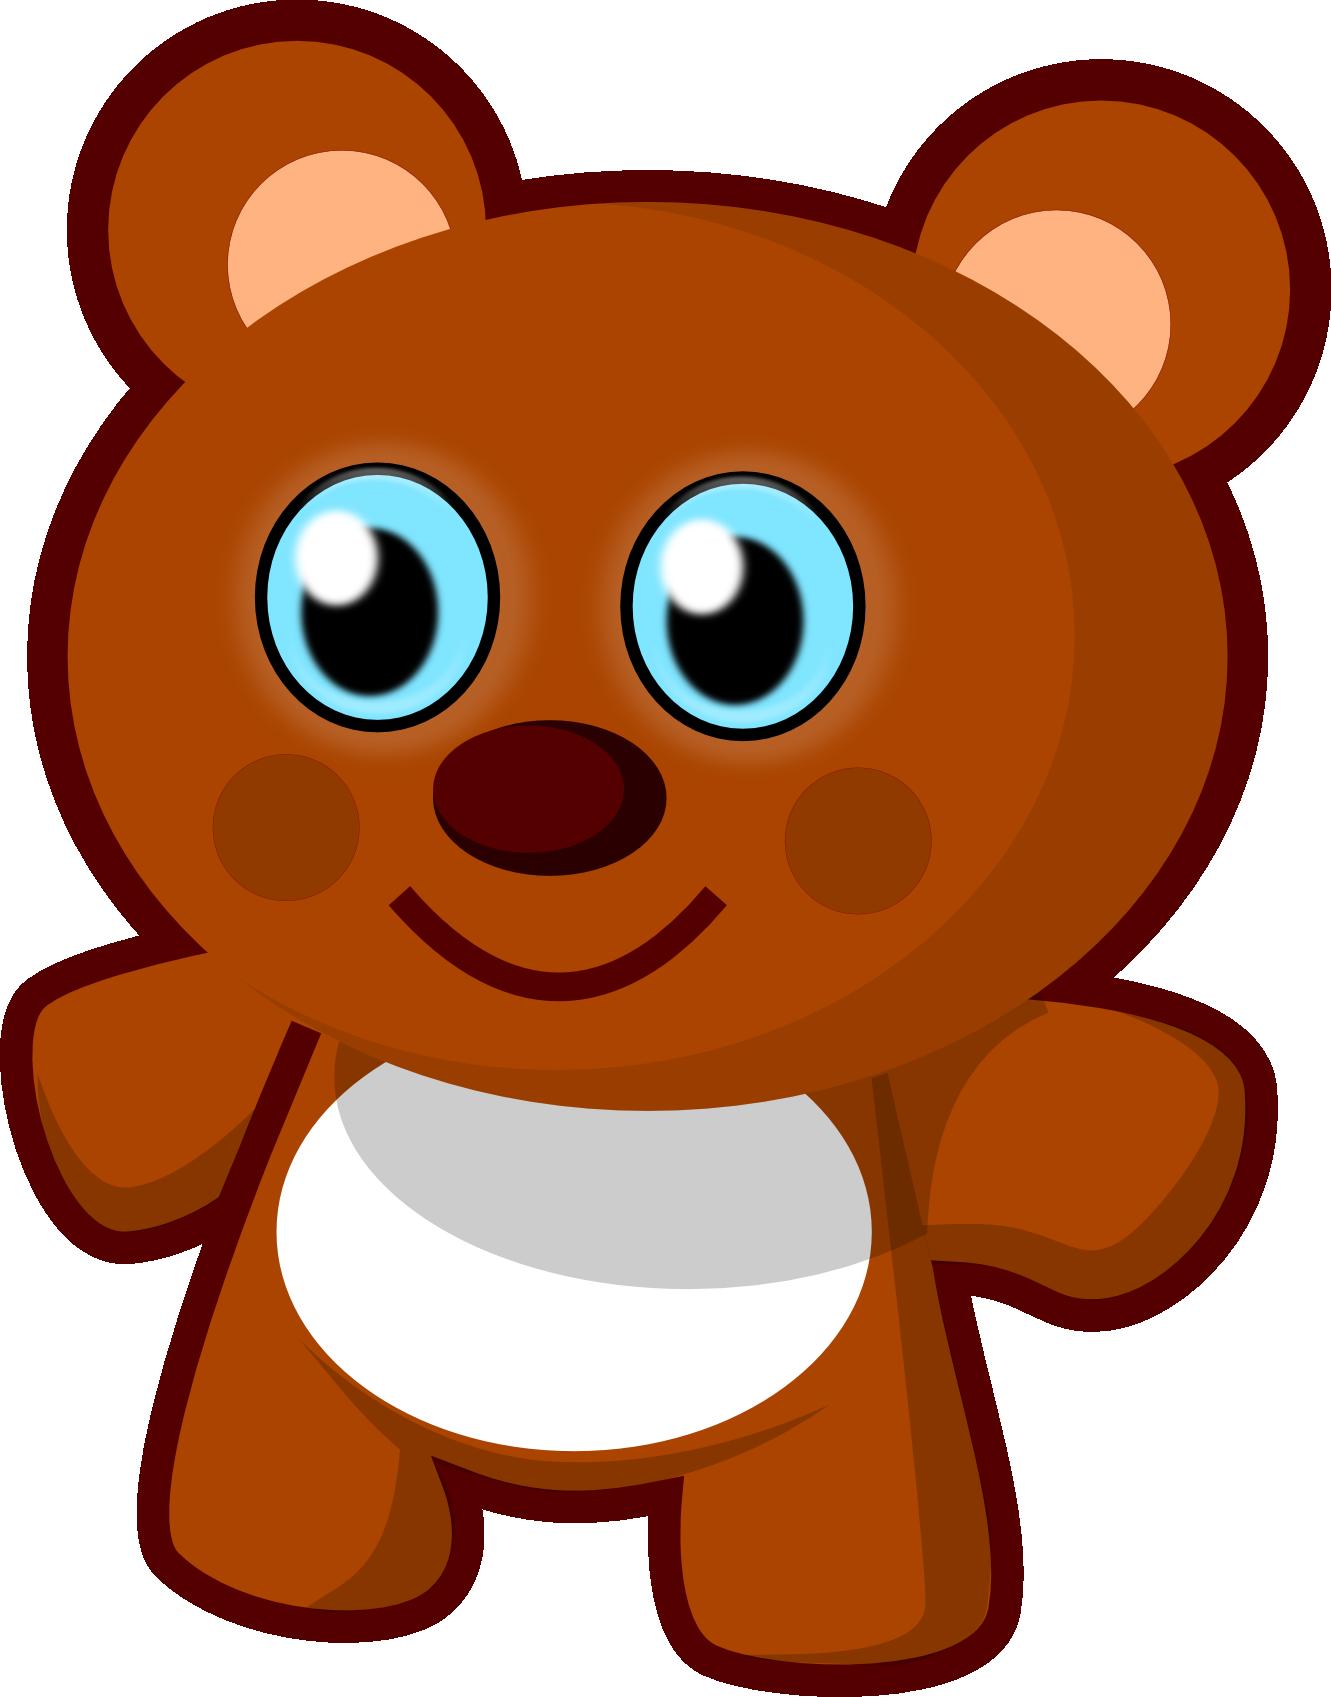 Cute Bear Clipart Clipart Panda Free Clipart Images